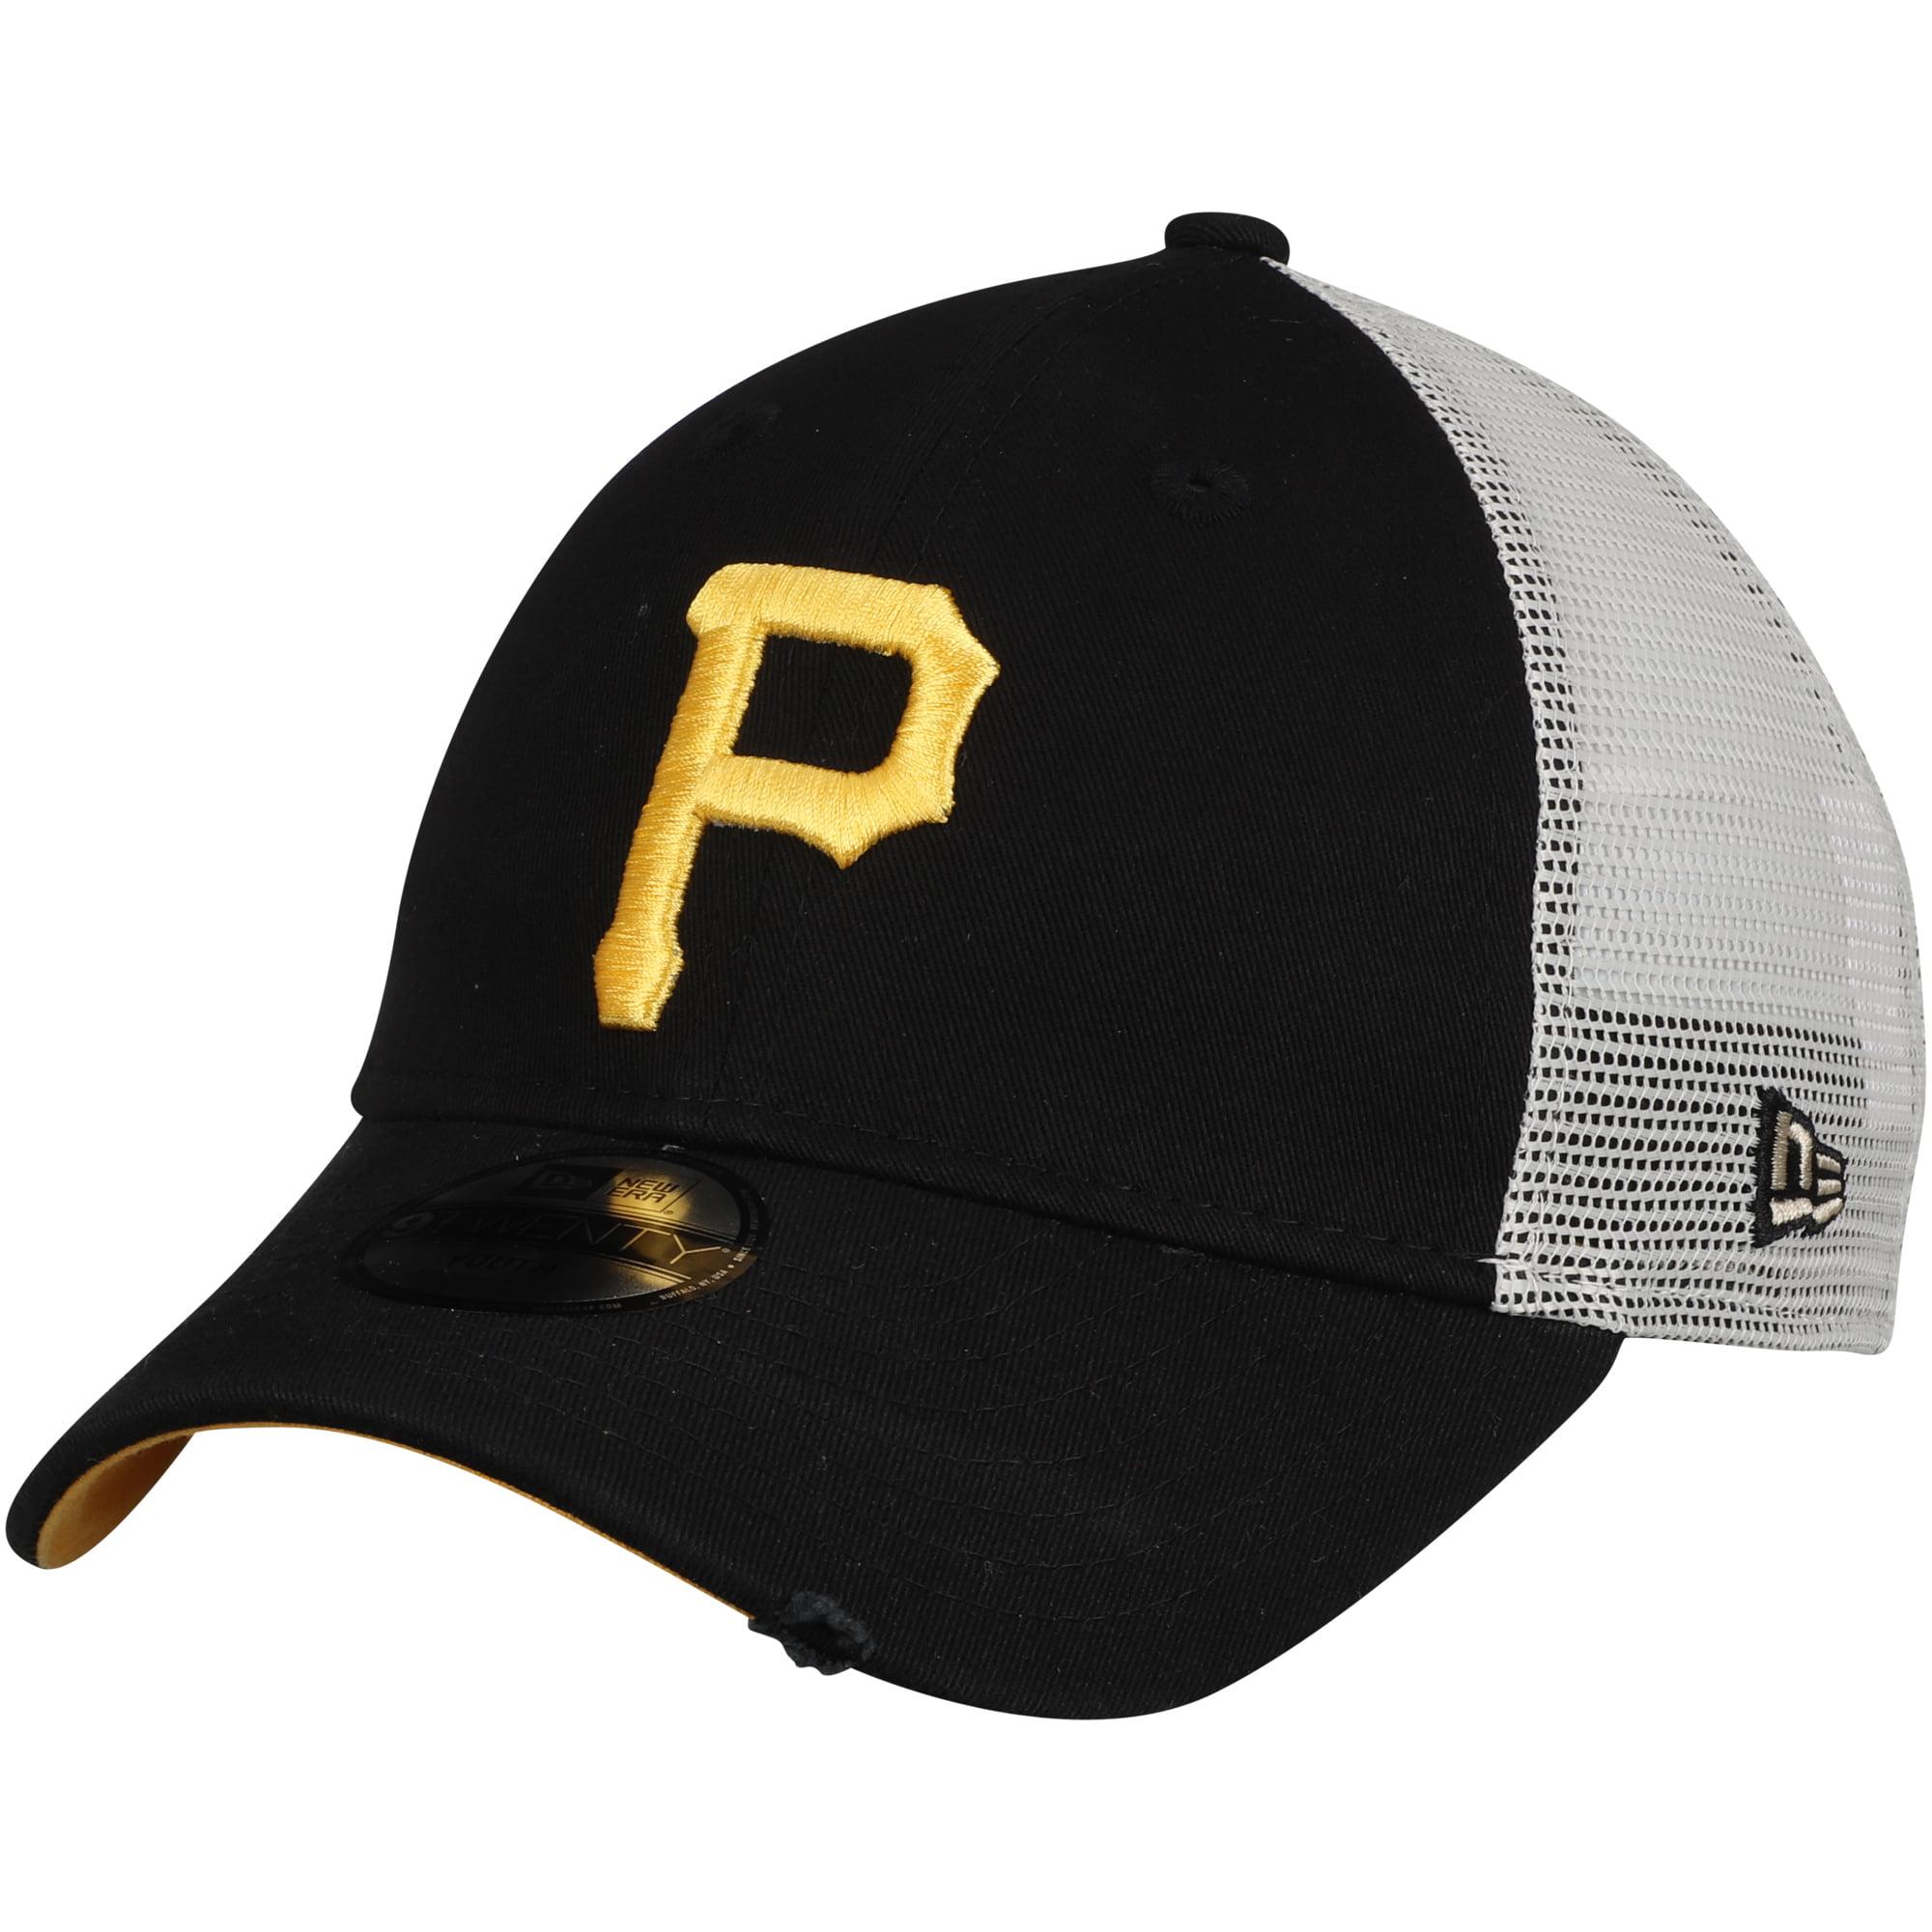 Pittsburgh Pirates New Era Youth Junior Stated Back Trucker 9TWENTY Adjustable Hat - Black - OSFA